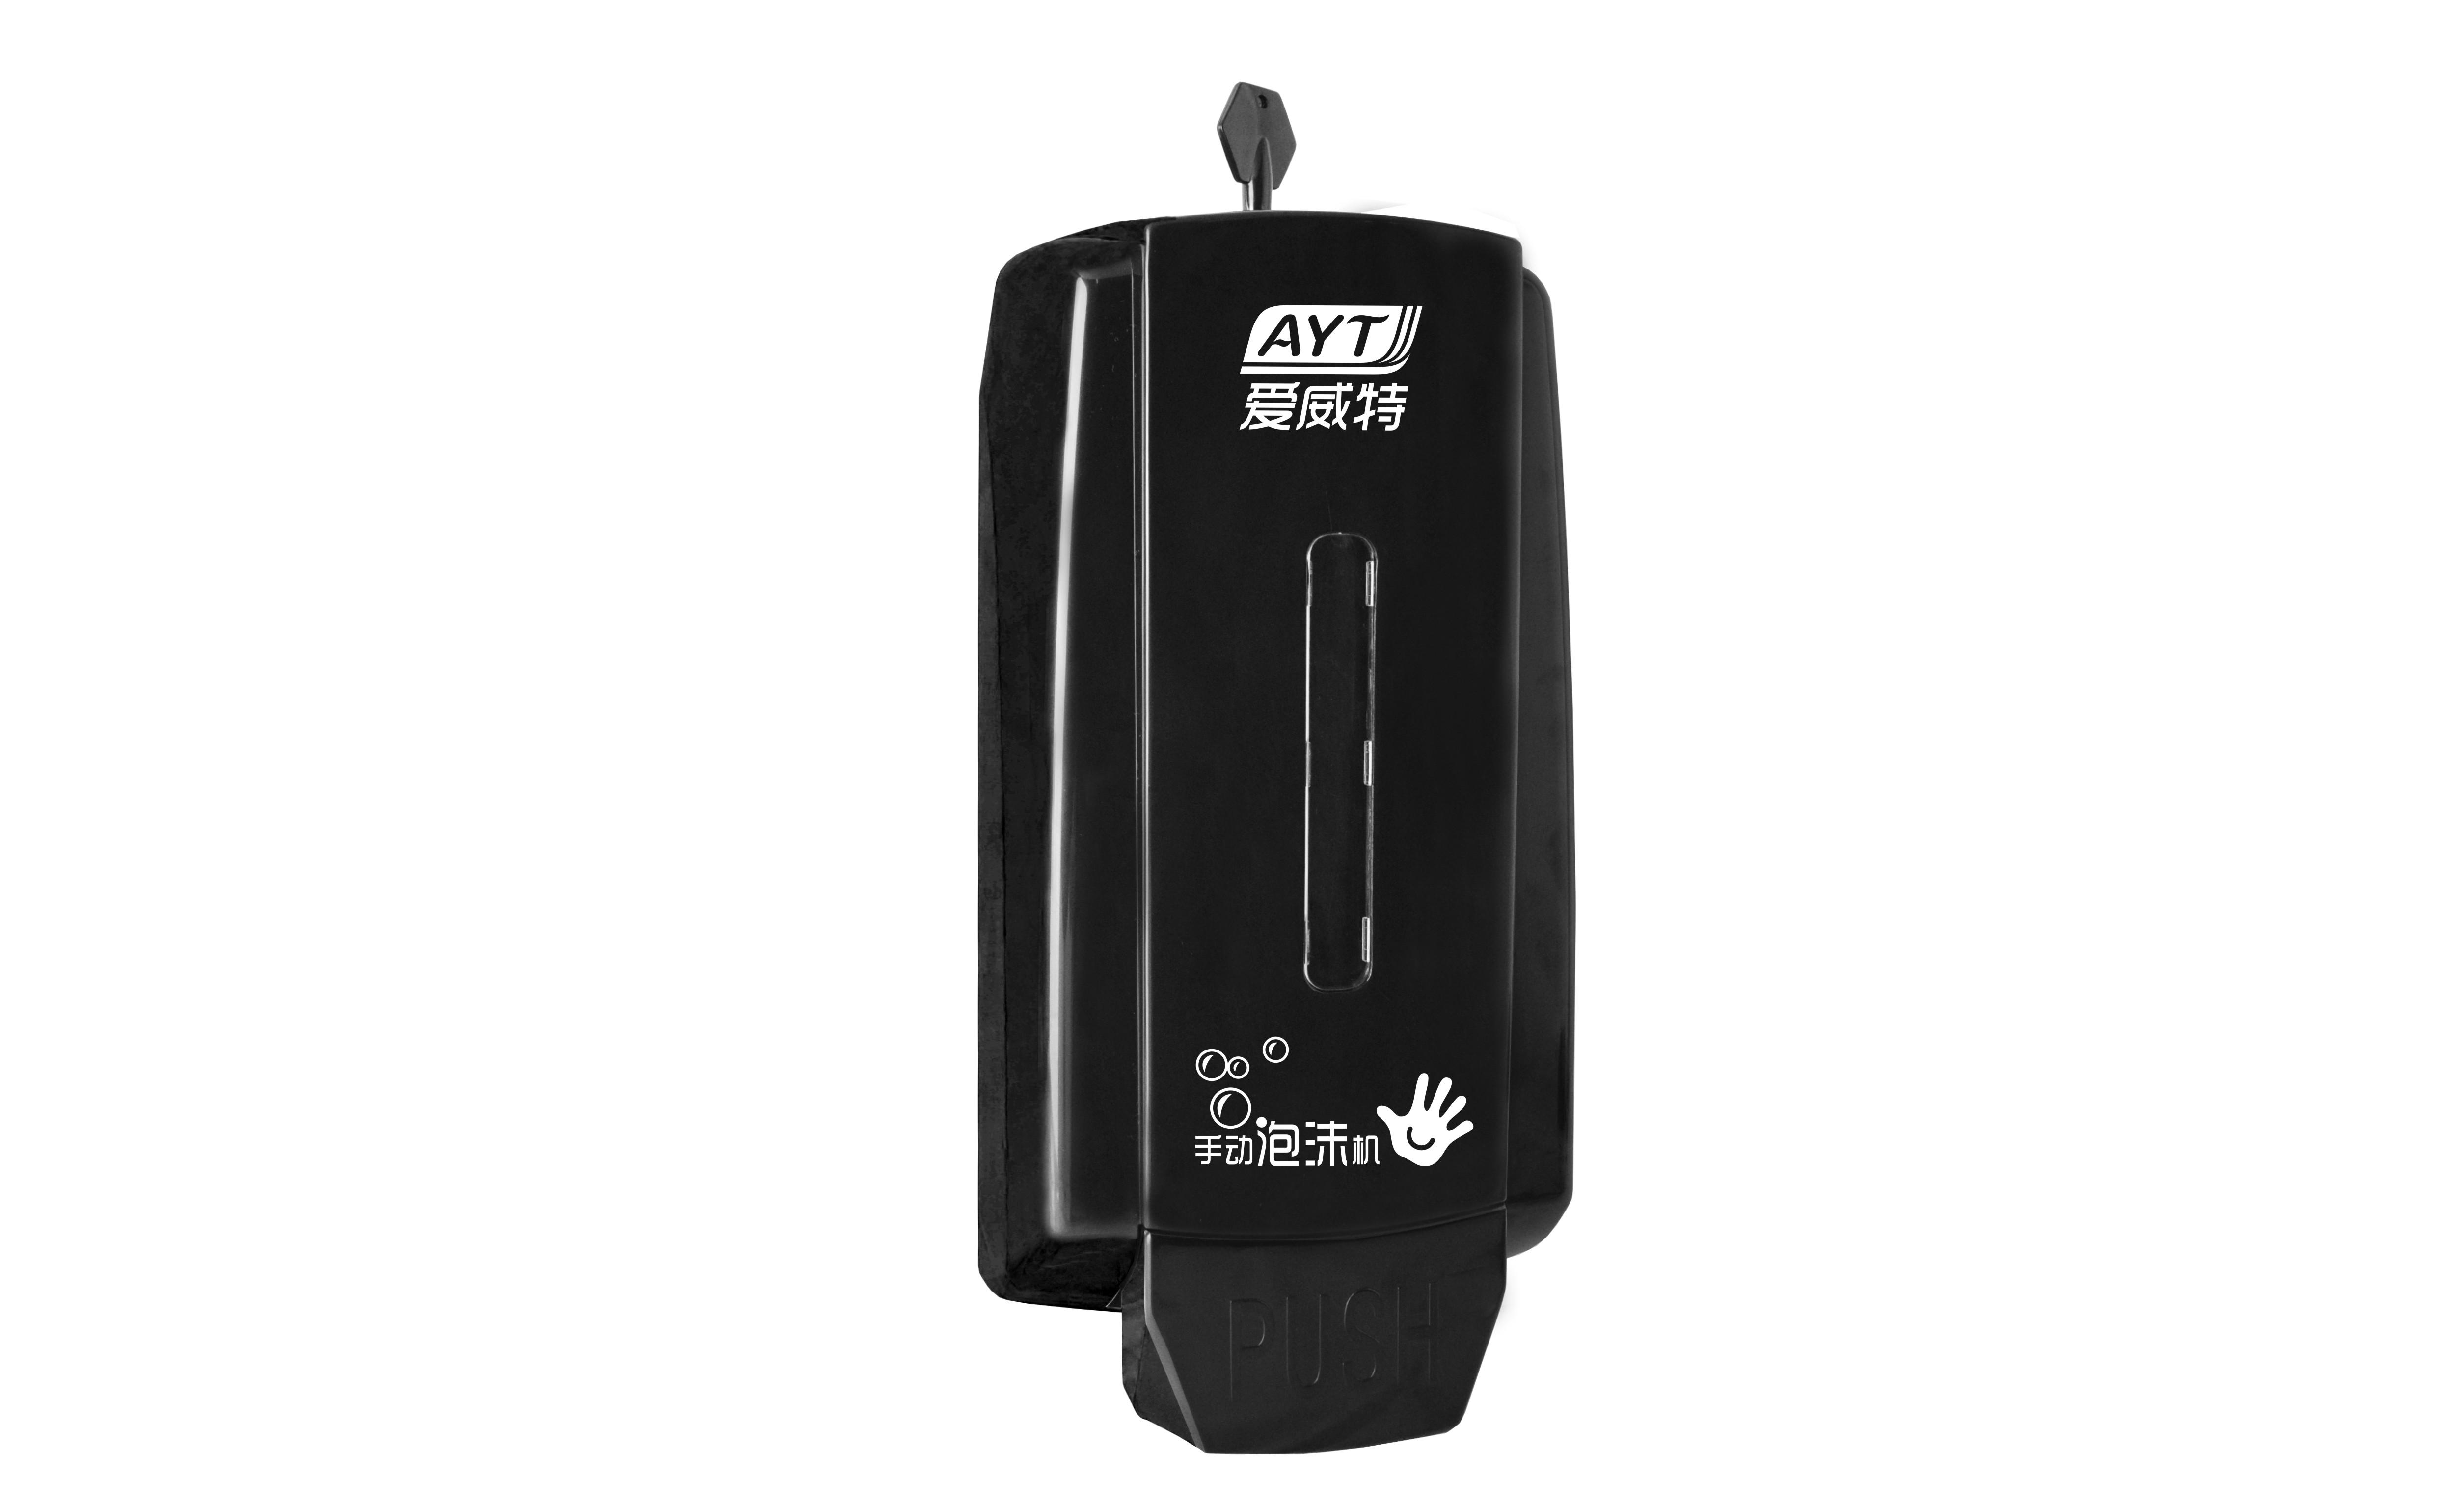 Ayt-668(black) plastic manual soap dispenser